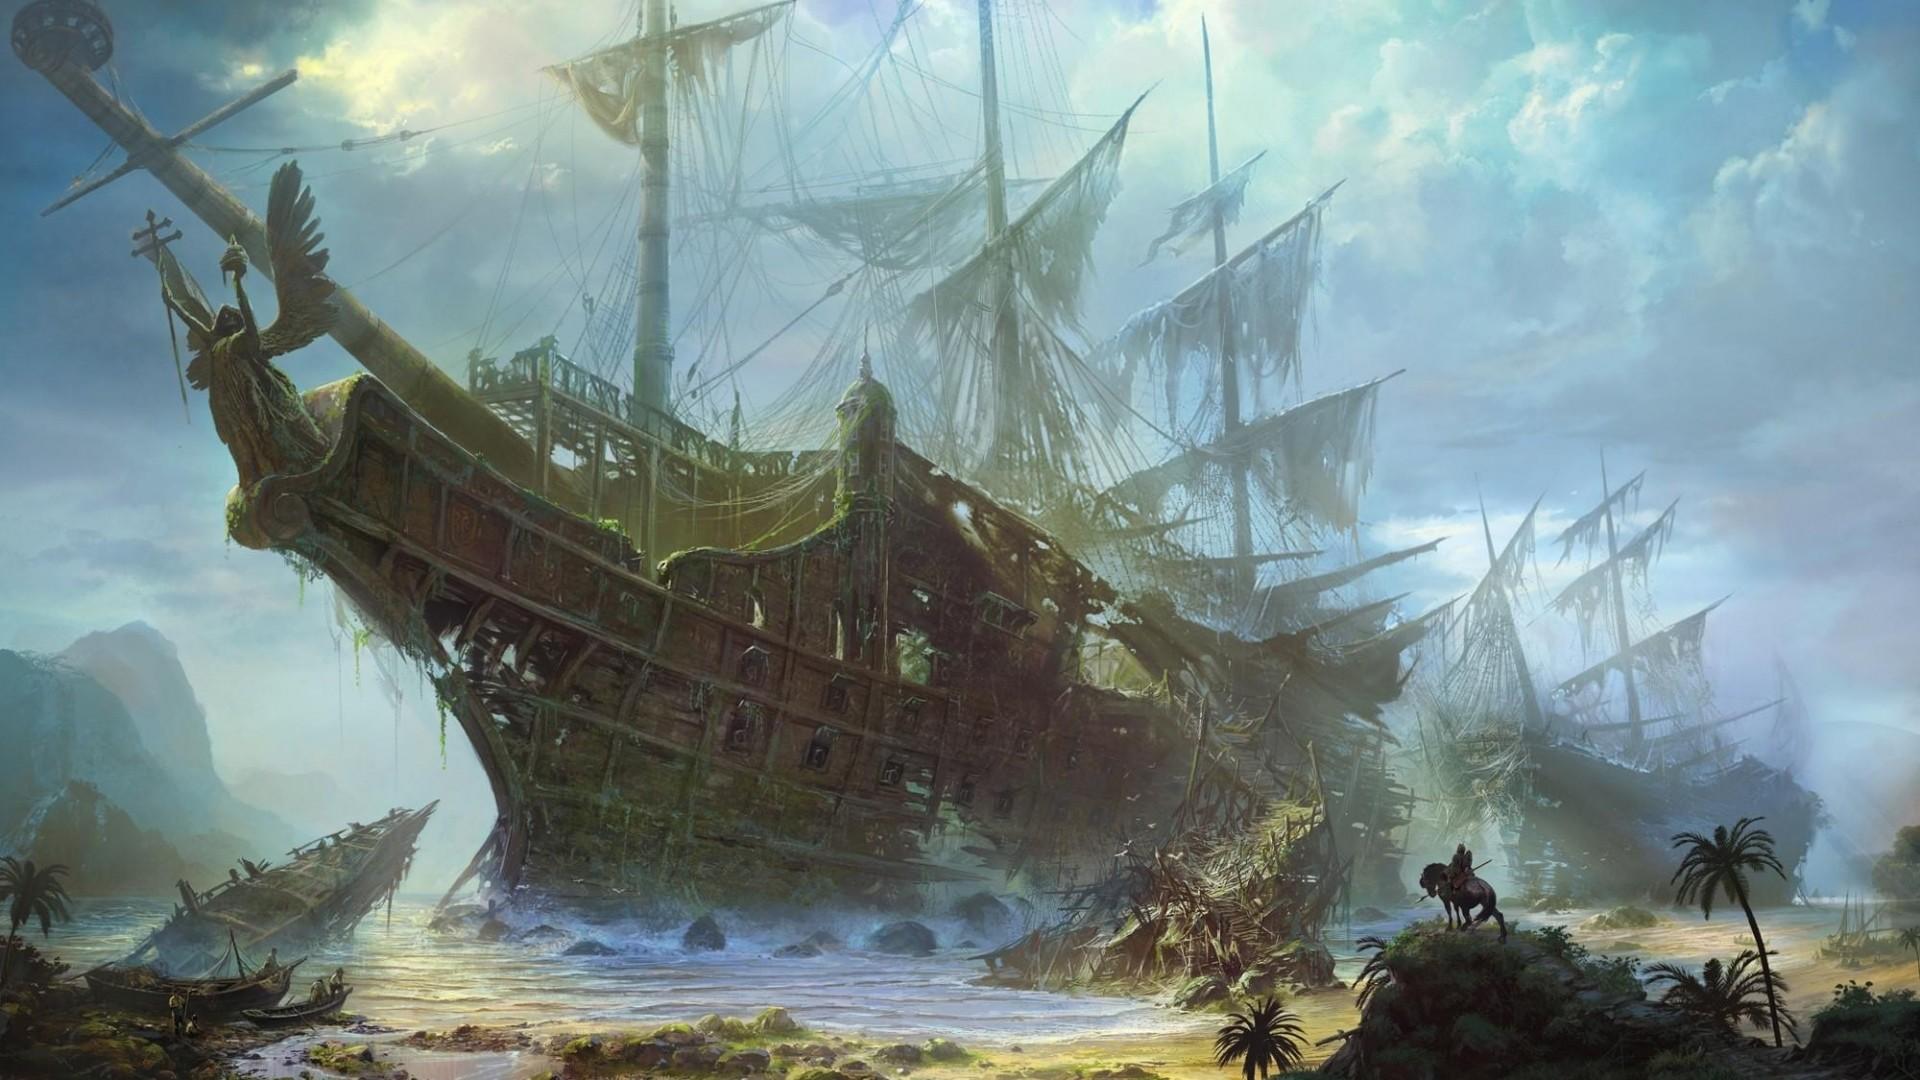 Wallpaper ships, old, wreckage, beach, sea, sky, clouds